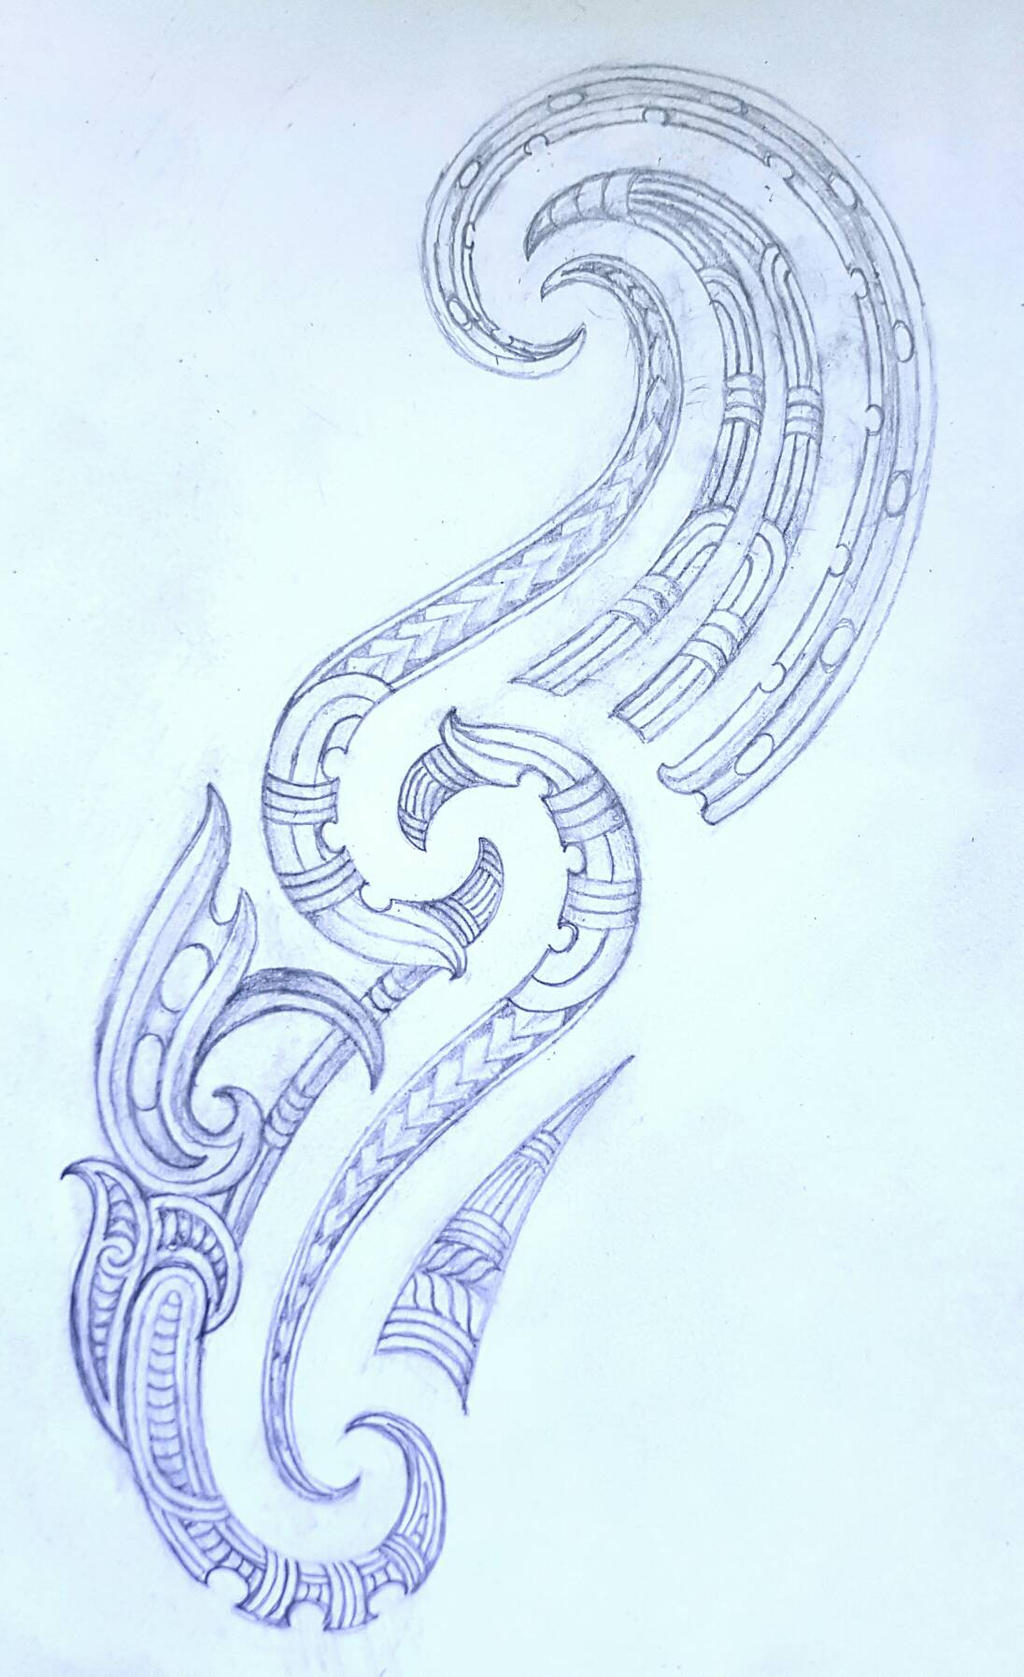 maori tattoo design by savagewerx